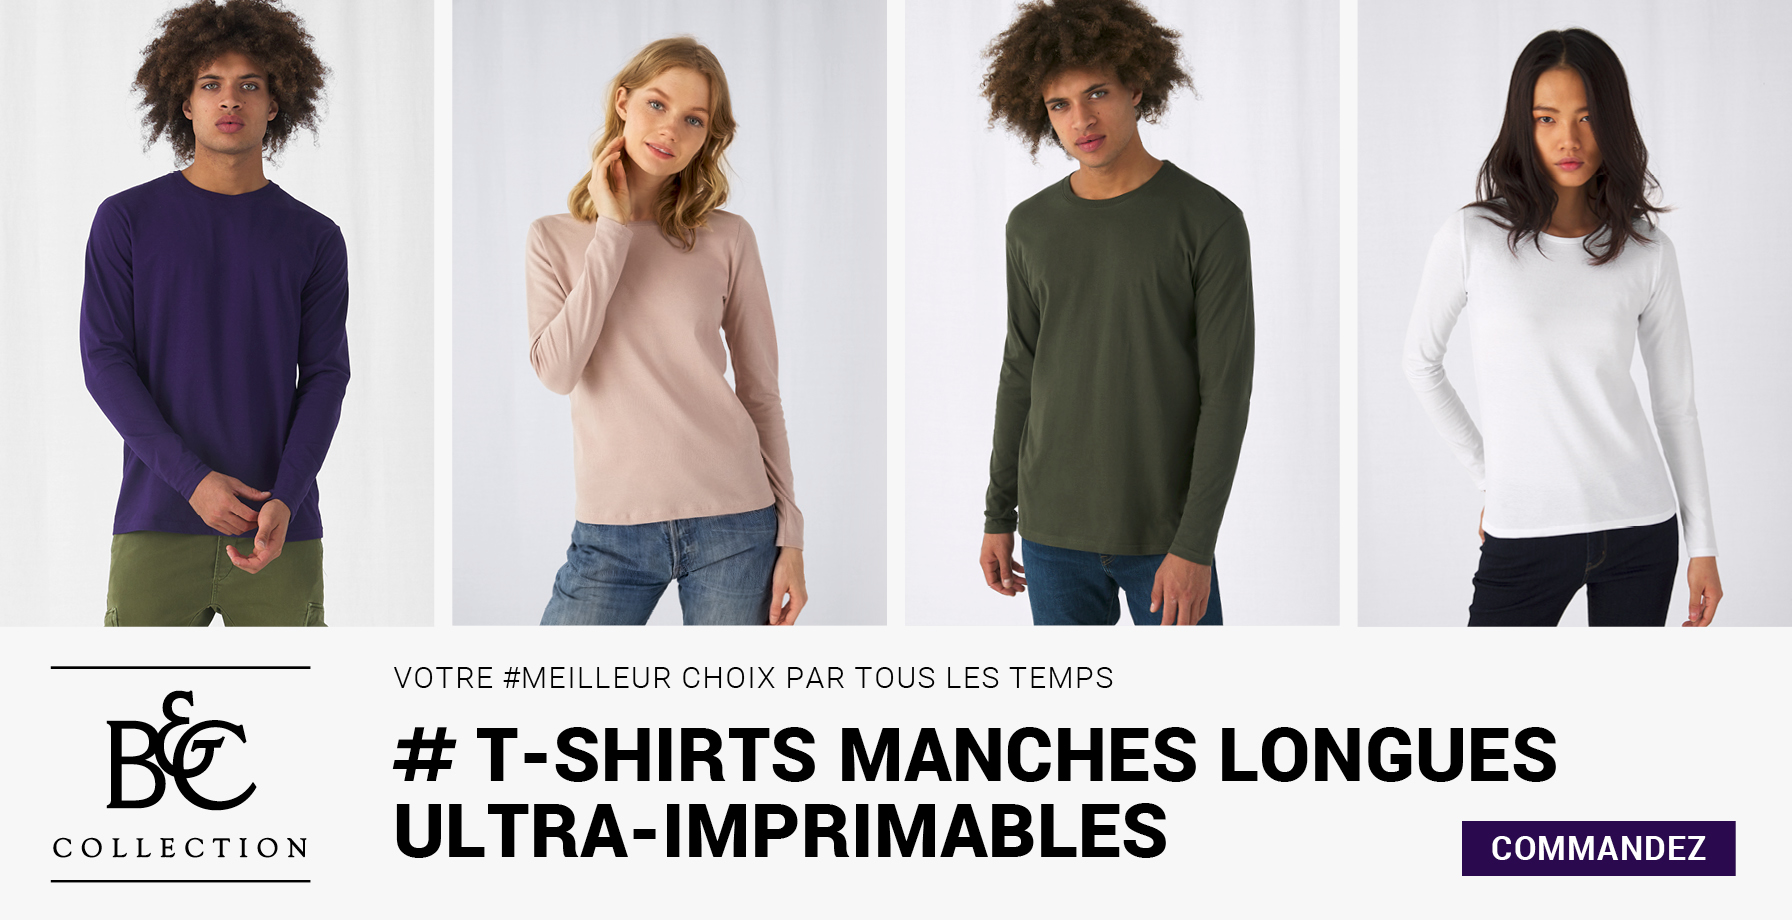 B&C - T-SHIRTS MANCHES LONGUES